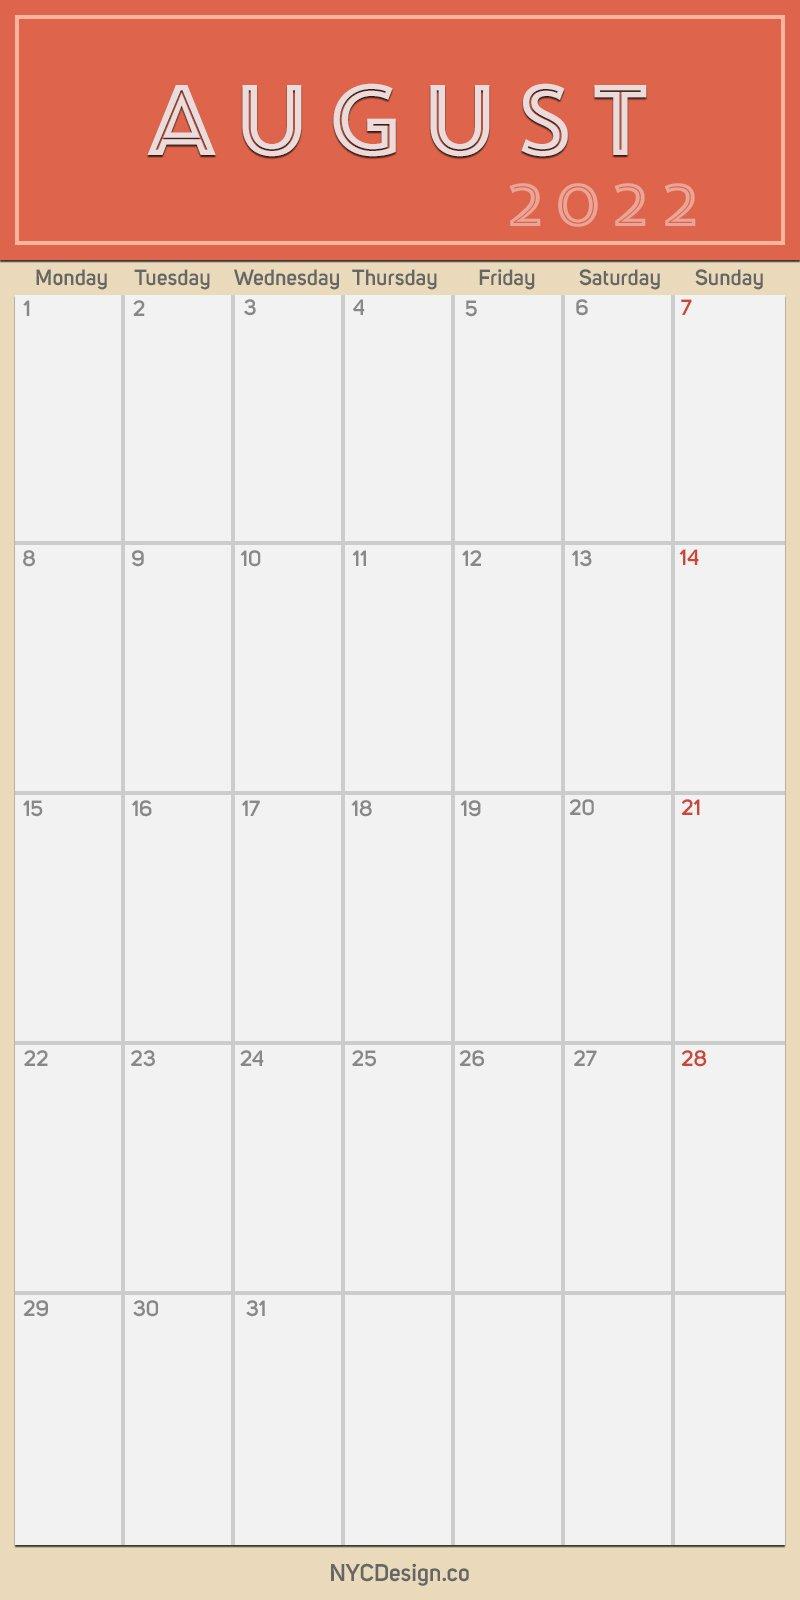 2022 August - Monthly Calendar, Planner, Printable Free throughout Printable Monthly Calendar August 2022